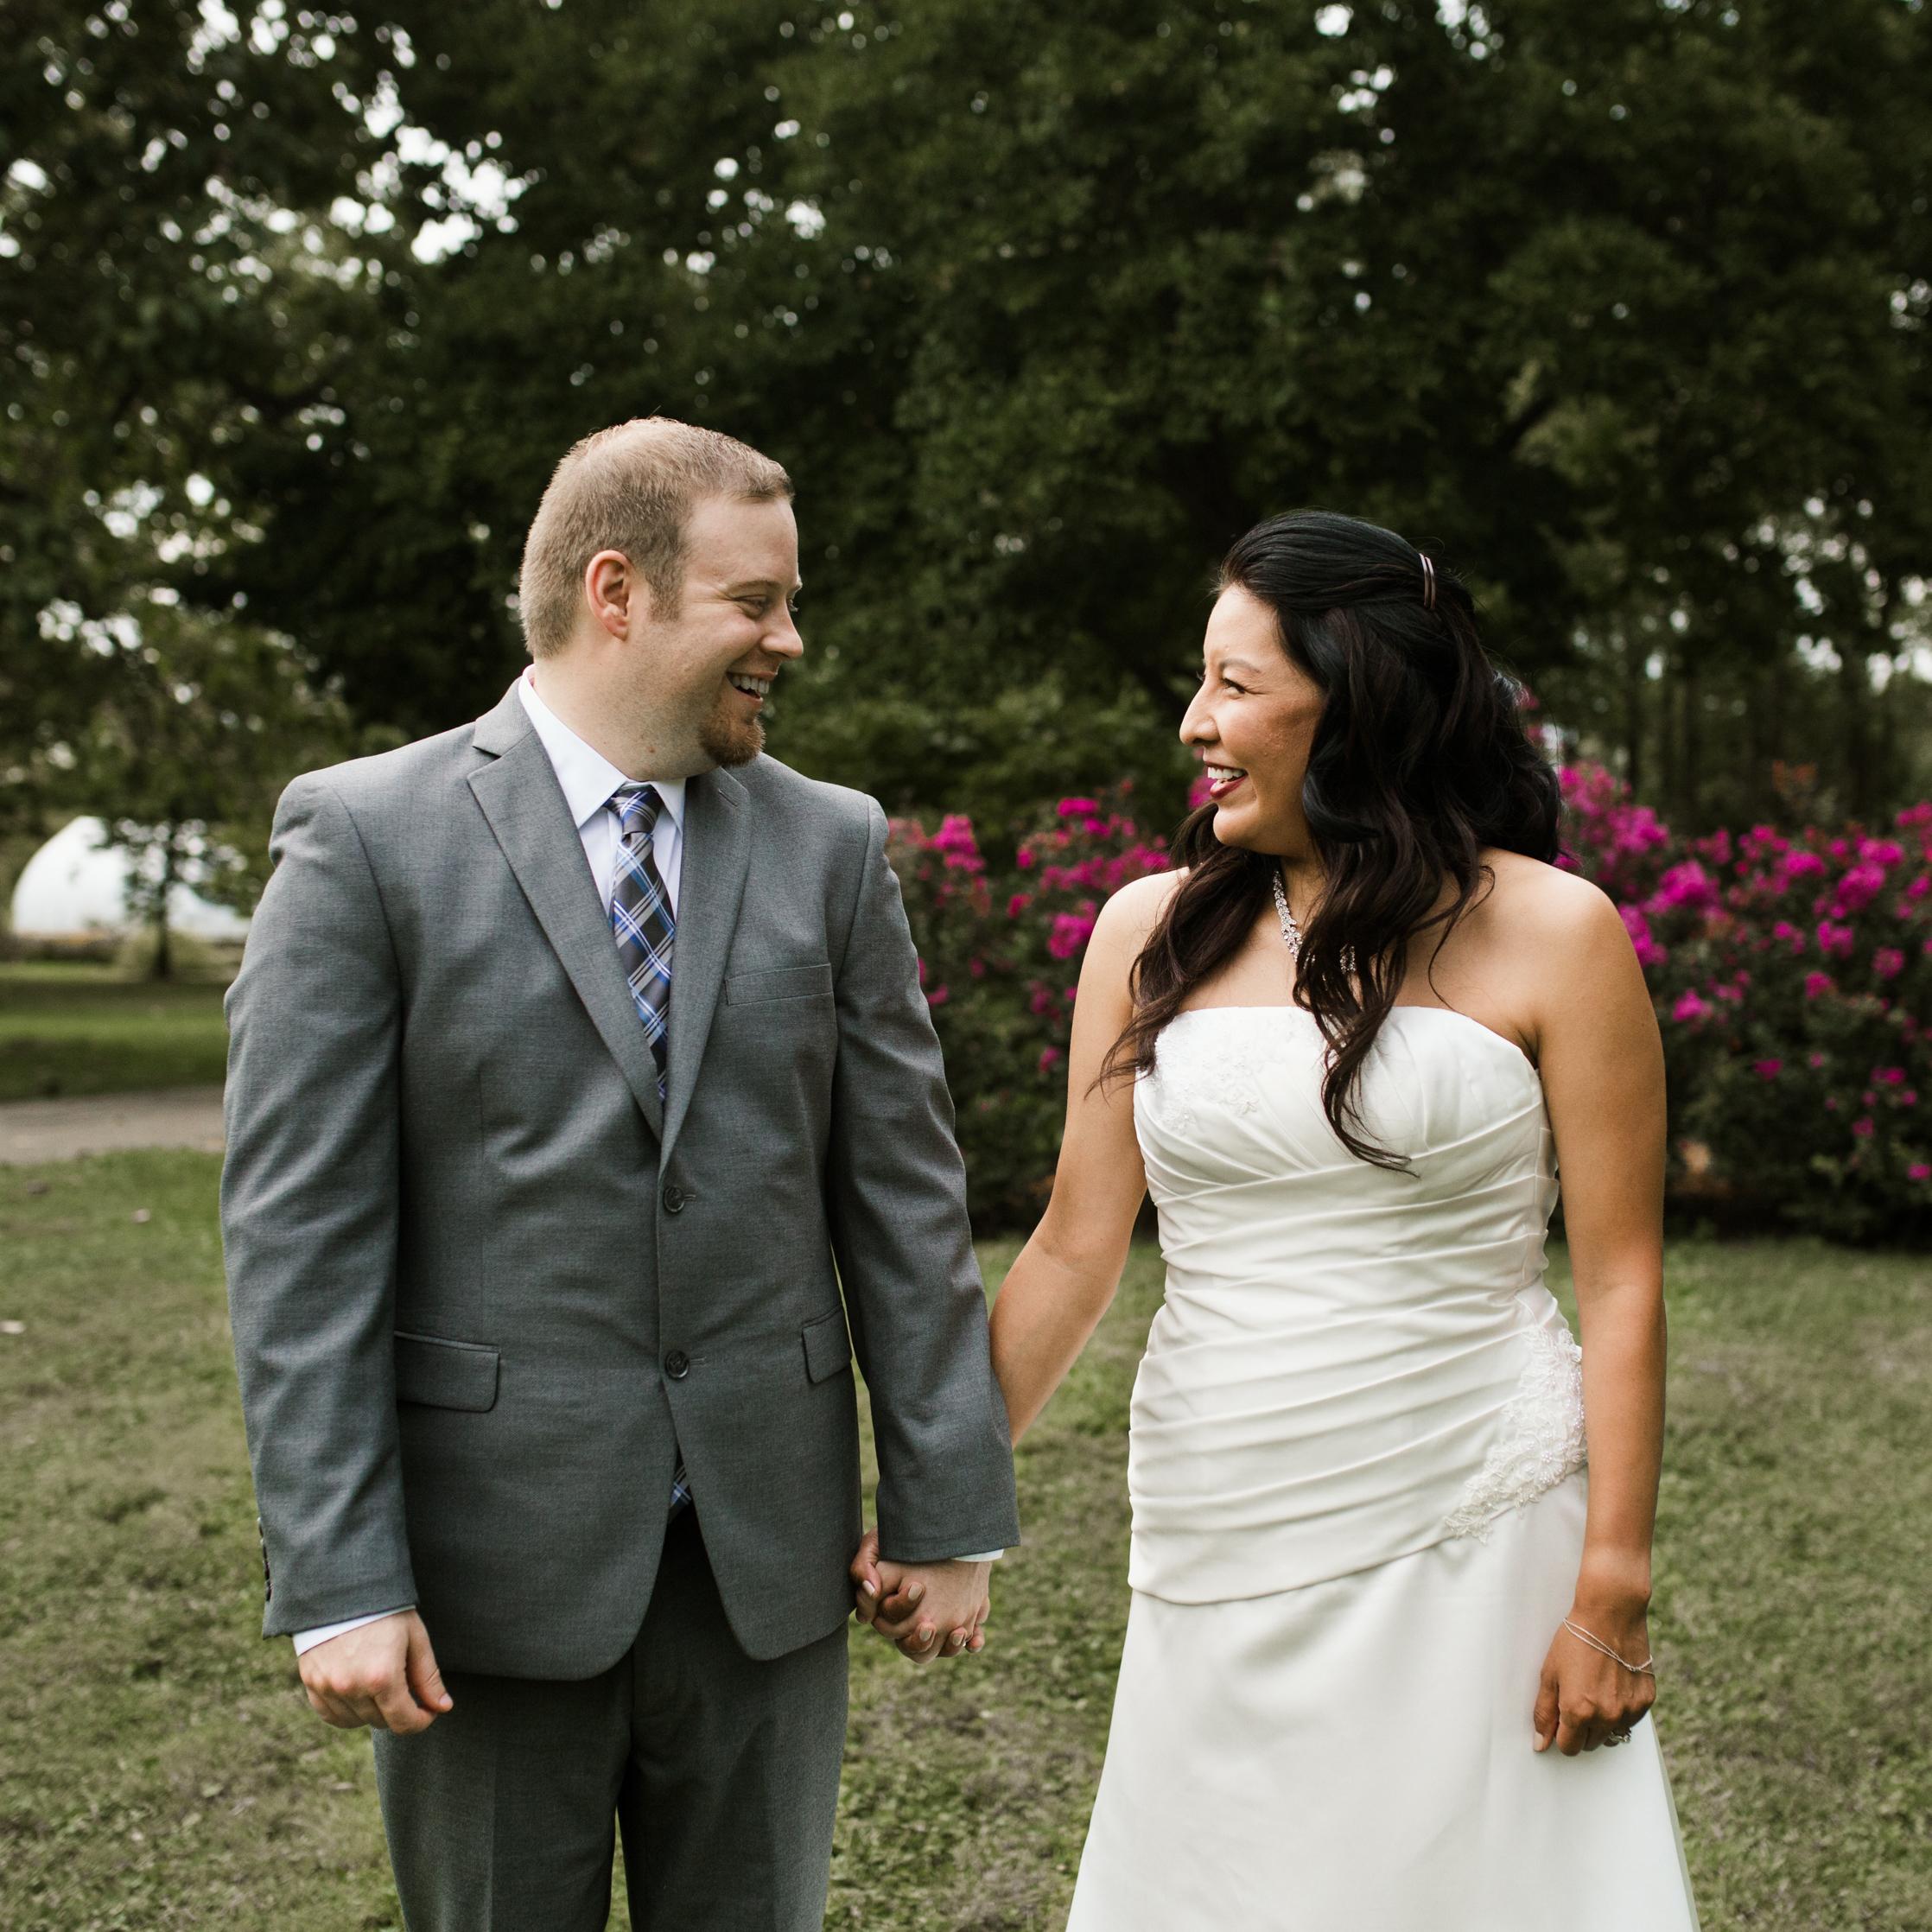 Kentucky Wedding Louisville Wedding Photographer 2018 Crystal Ludwick Photo Louisville Wedding Photographer Kentucky Wedding Photographer (66 of 76).jpg